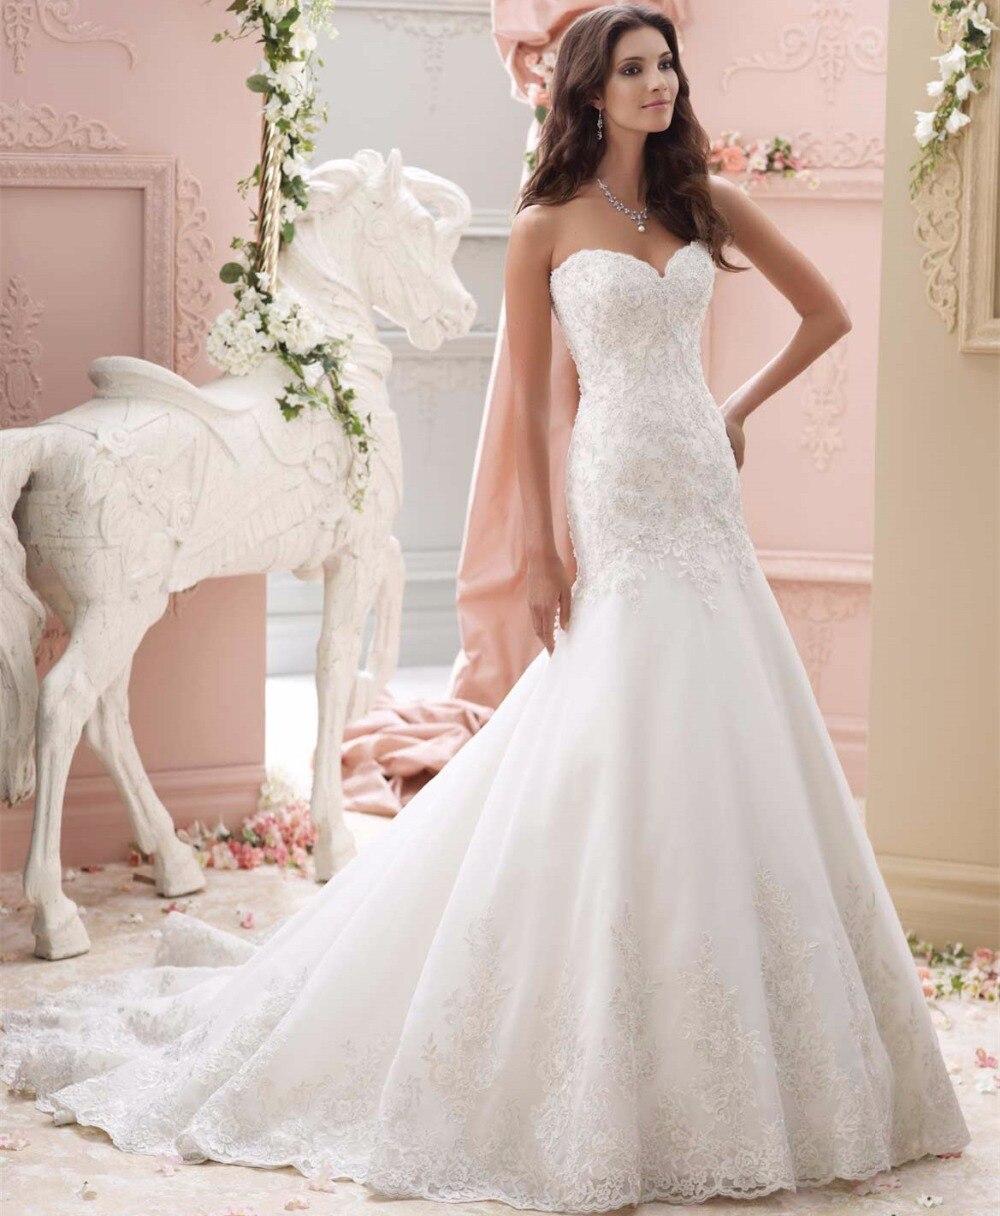 Aliexpress.com : Buy Classical Style Sexy Mermaid Wedding